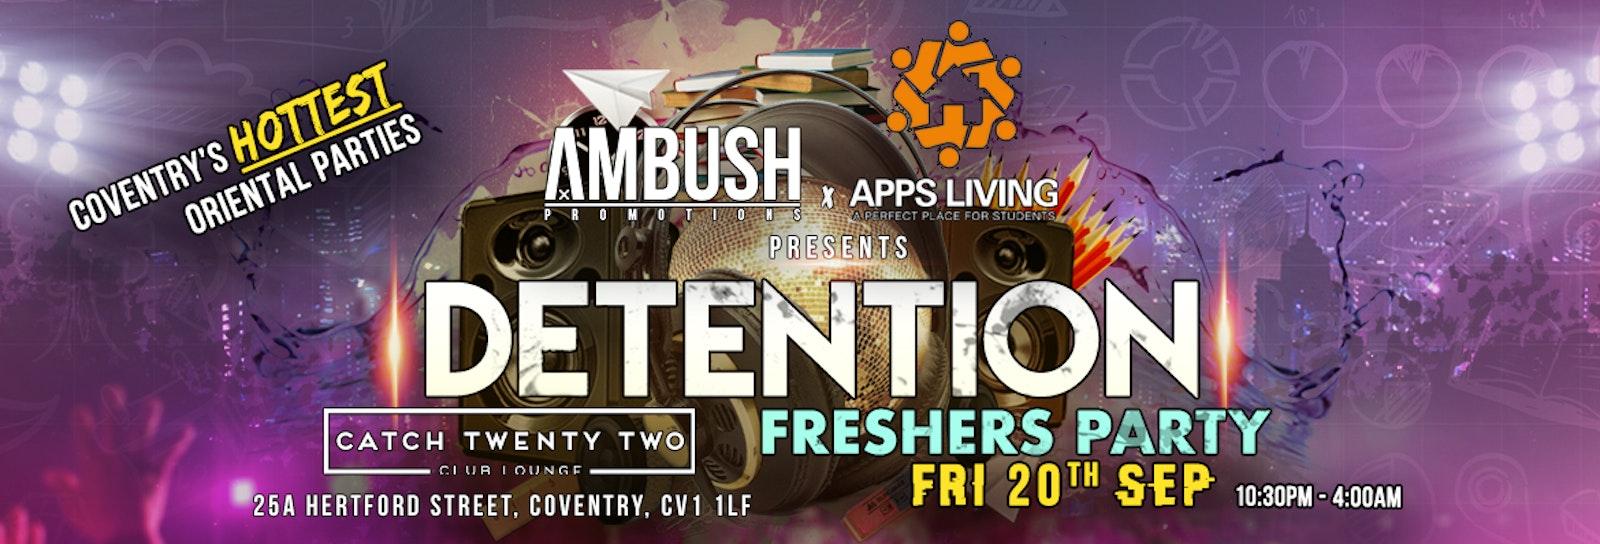 AMBUSH Asian Oriental Party | Catch Twenty Two